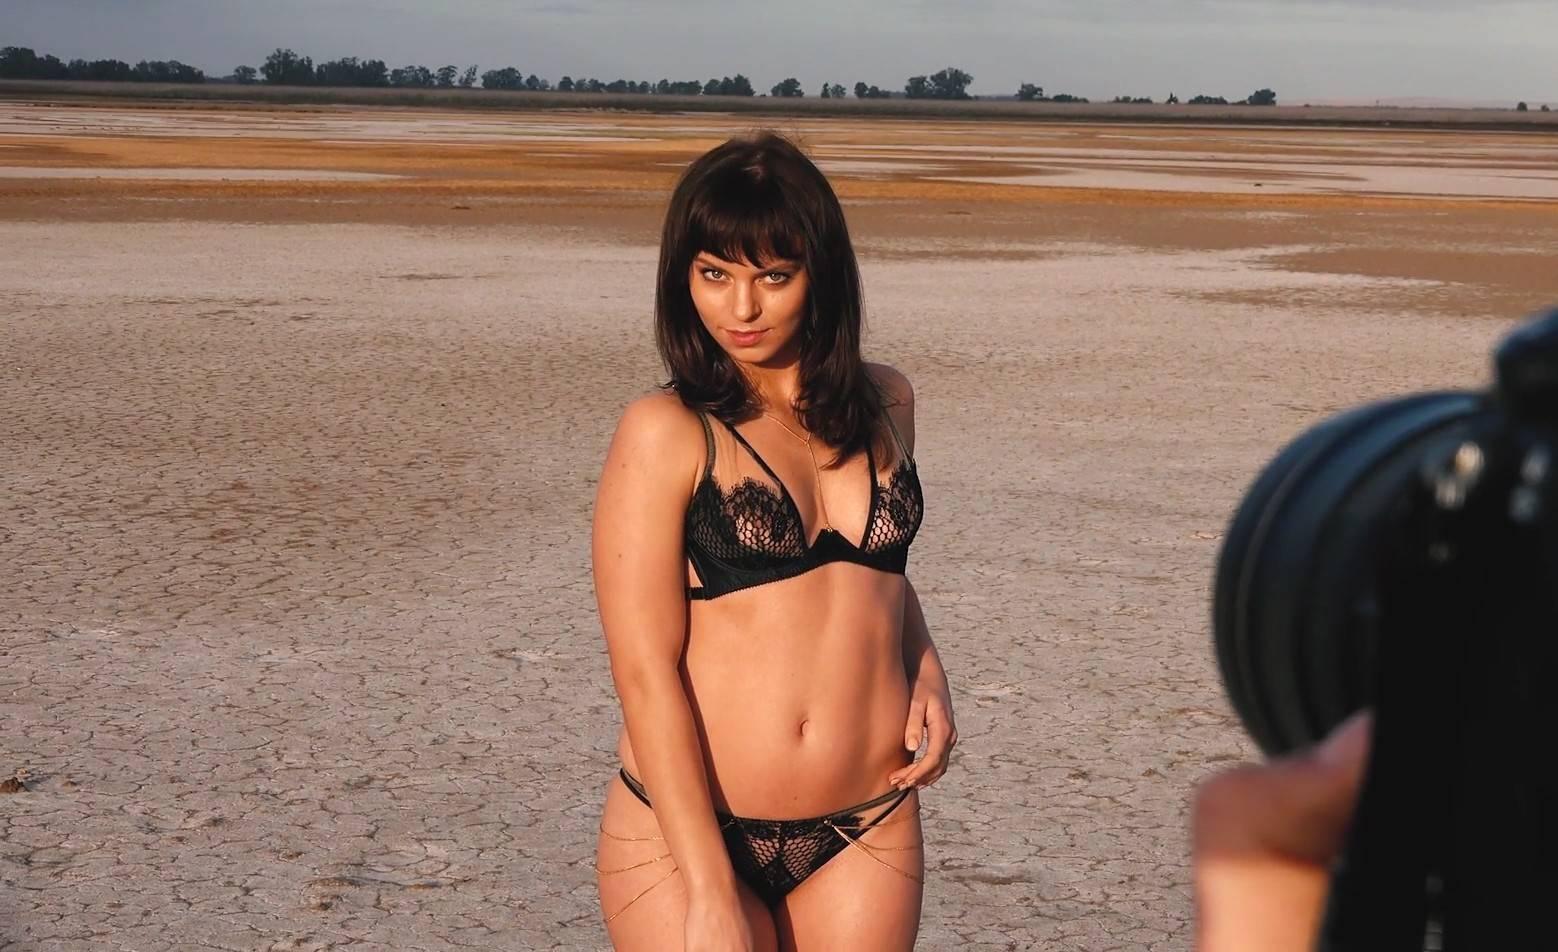 Franziska Benz - Playboy Germany September 2018 Coverstar